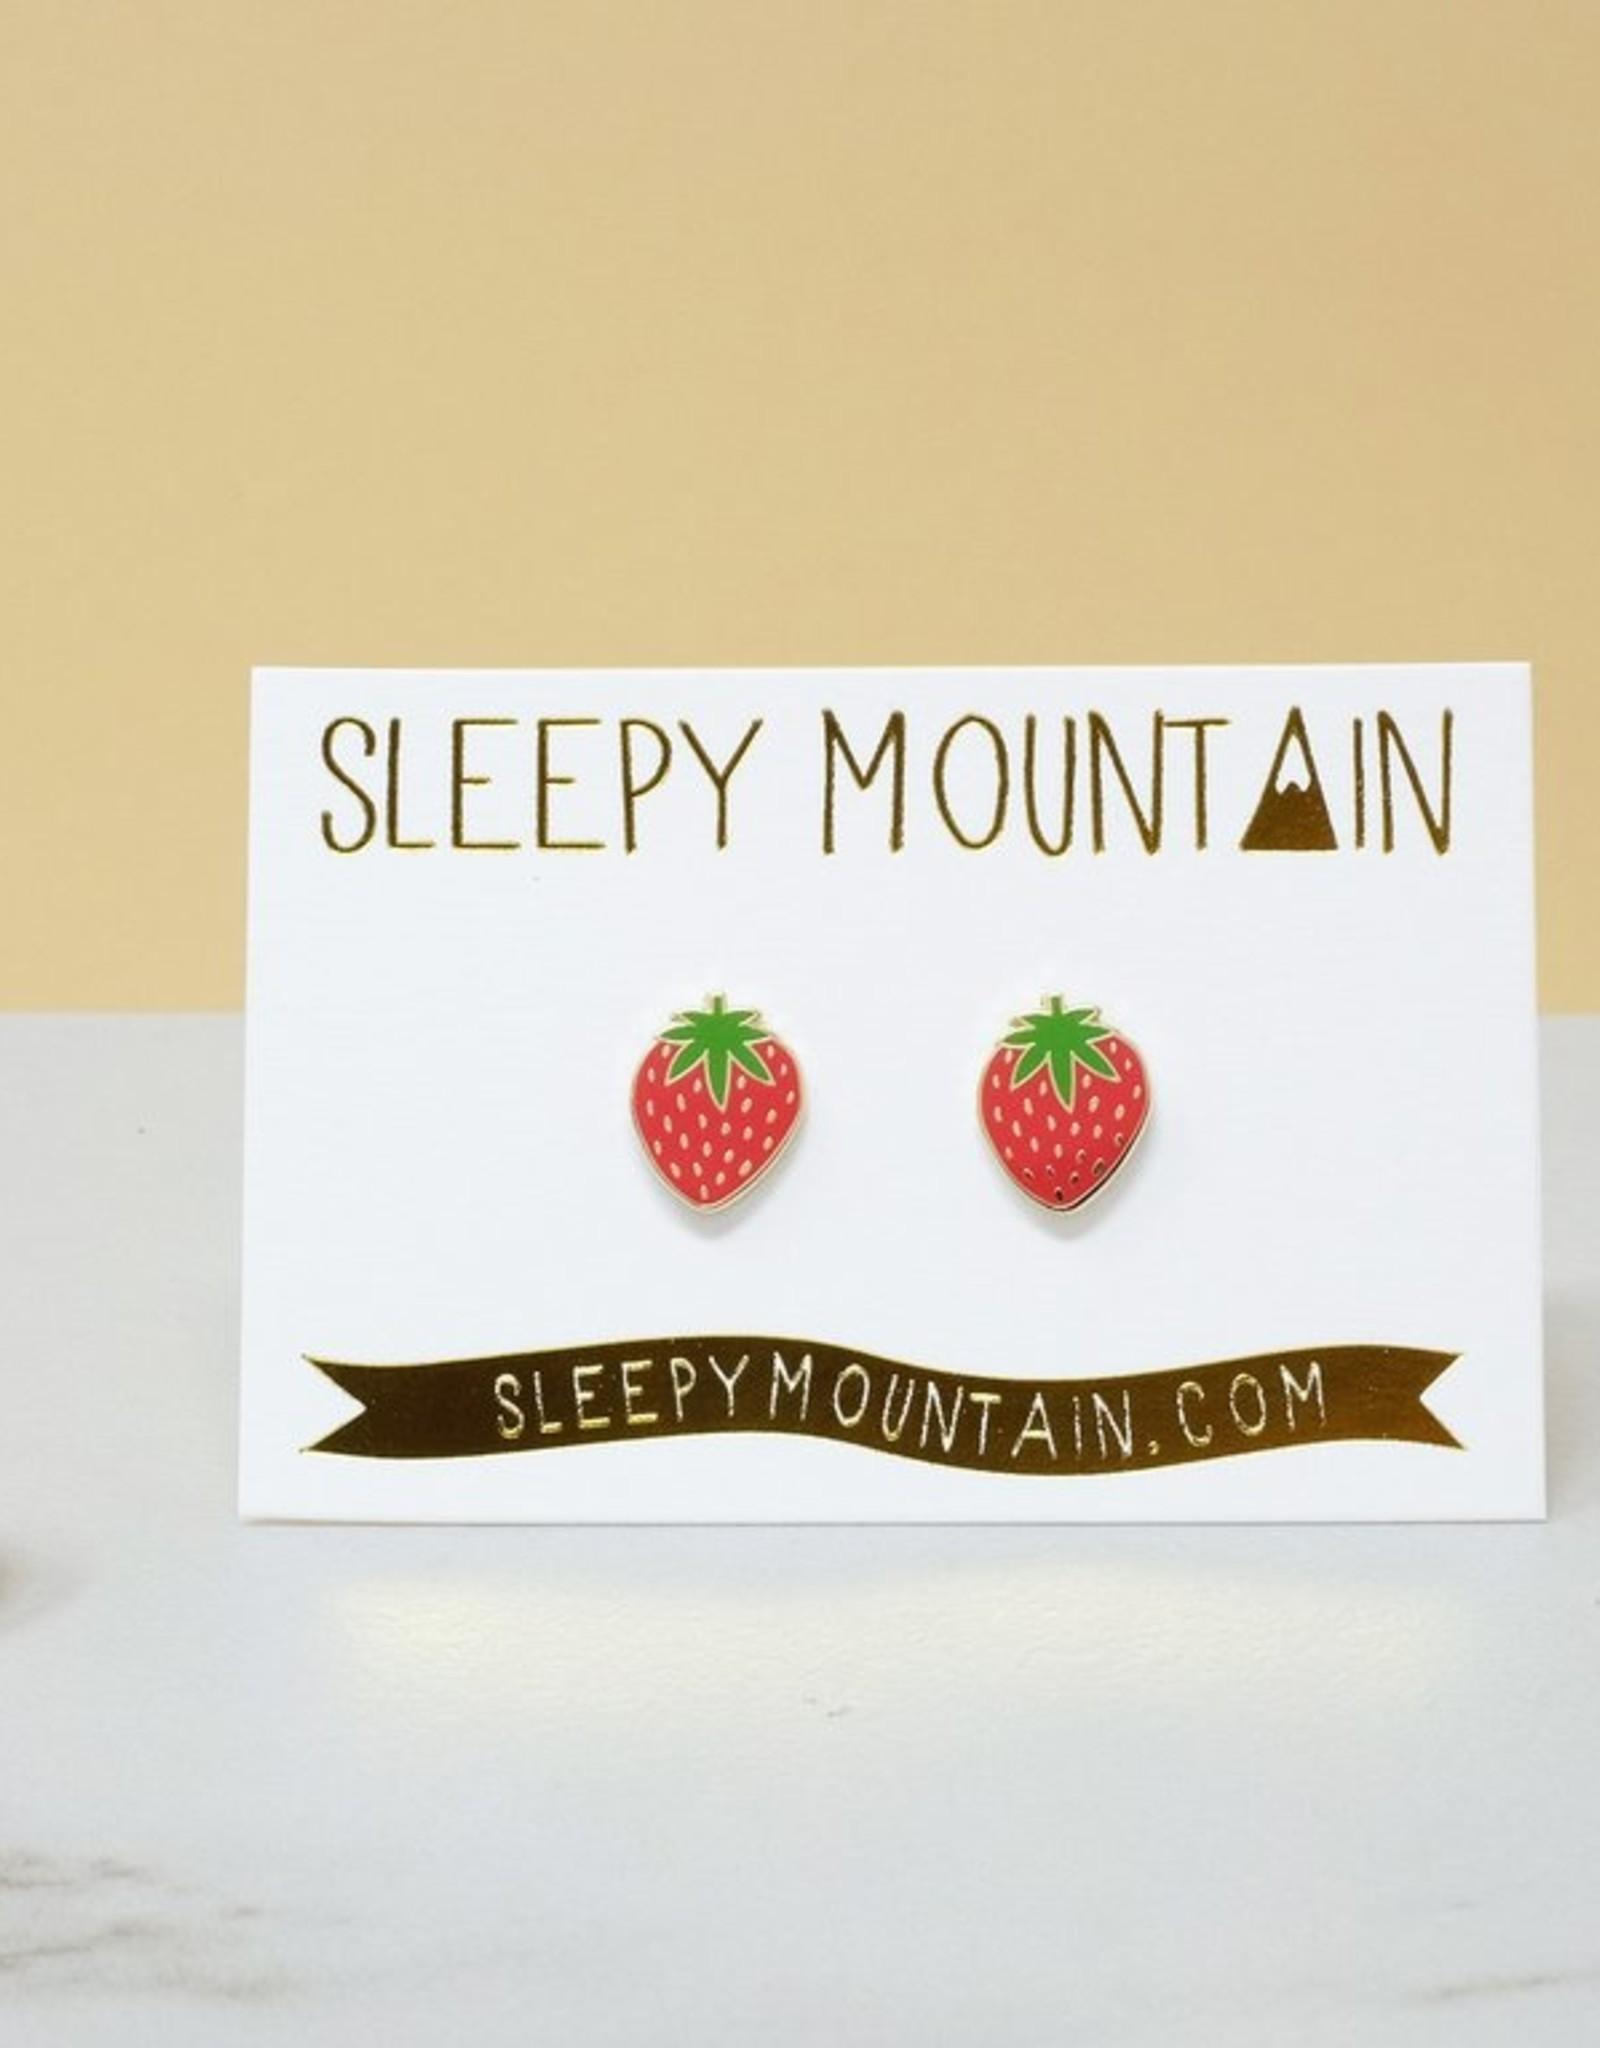 Sleepy Mountain More Gold Plated Earrings by Sleepy Mountain